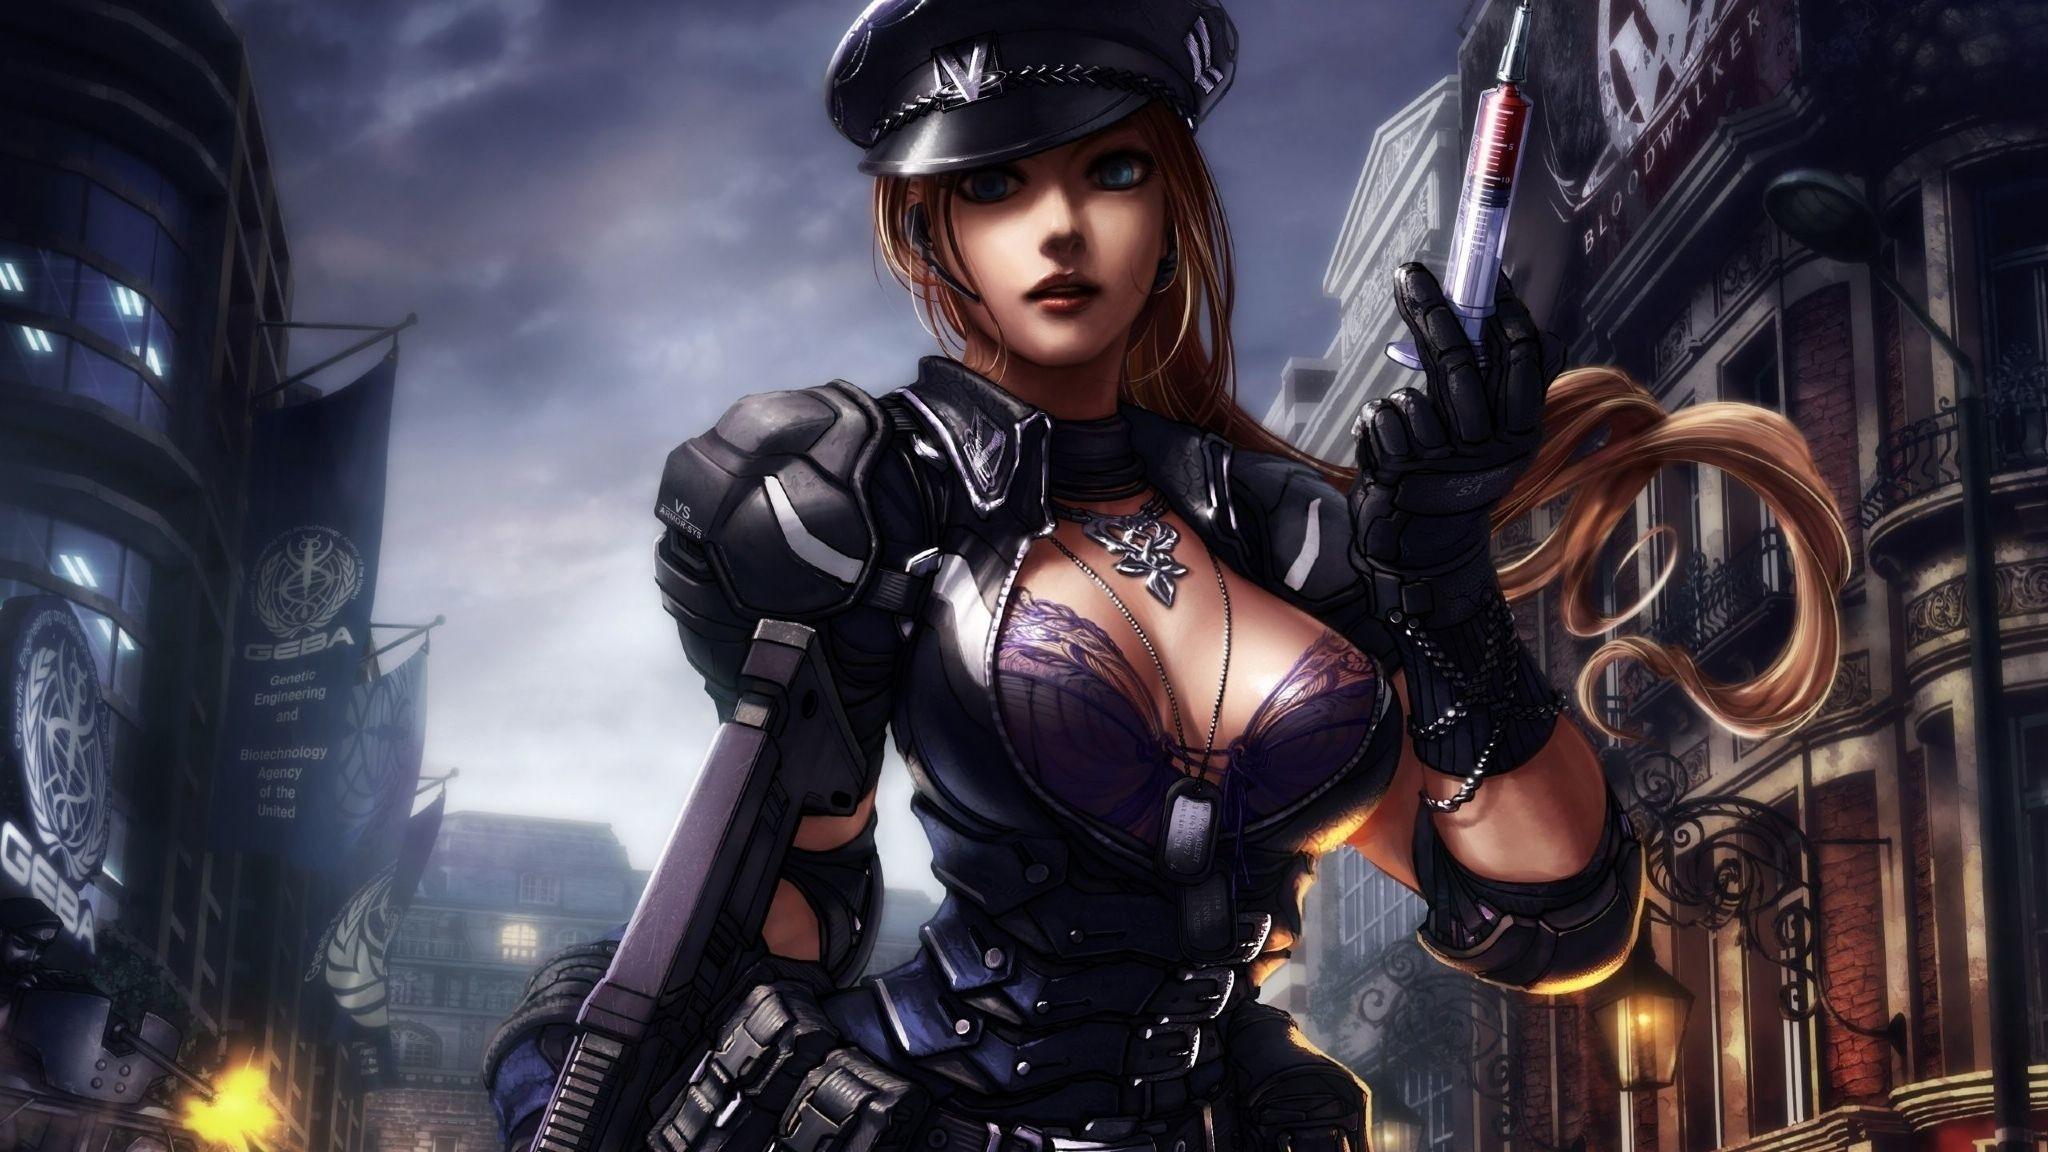 Res: 2048x1152, http://movie-star-planet-pics.blogspot.com/ #MSP #MovieStarPlanet #Pics  #Pictures #PUMP PLANET #PUMP_PLANET #3D #Girl #Babe #Model #Manga #Art # Gaming #Nerd ...